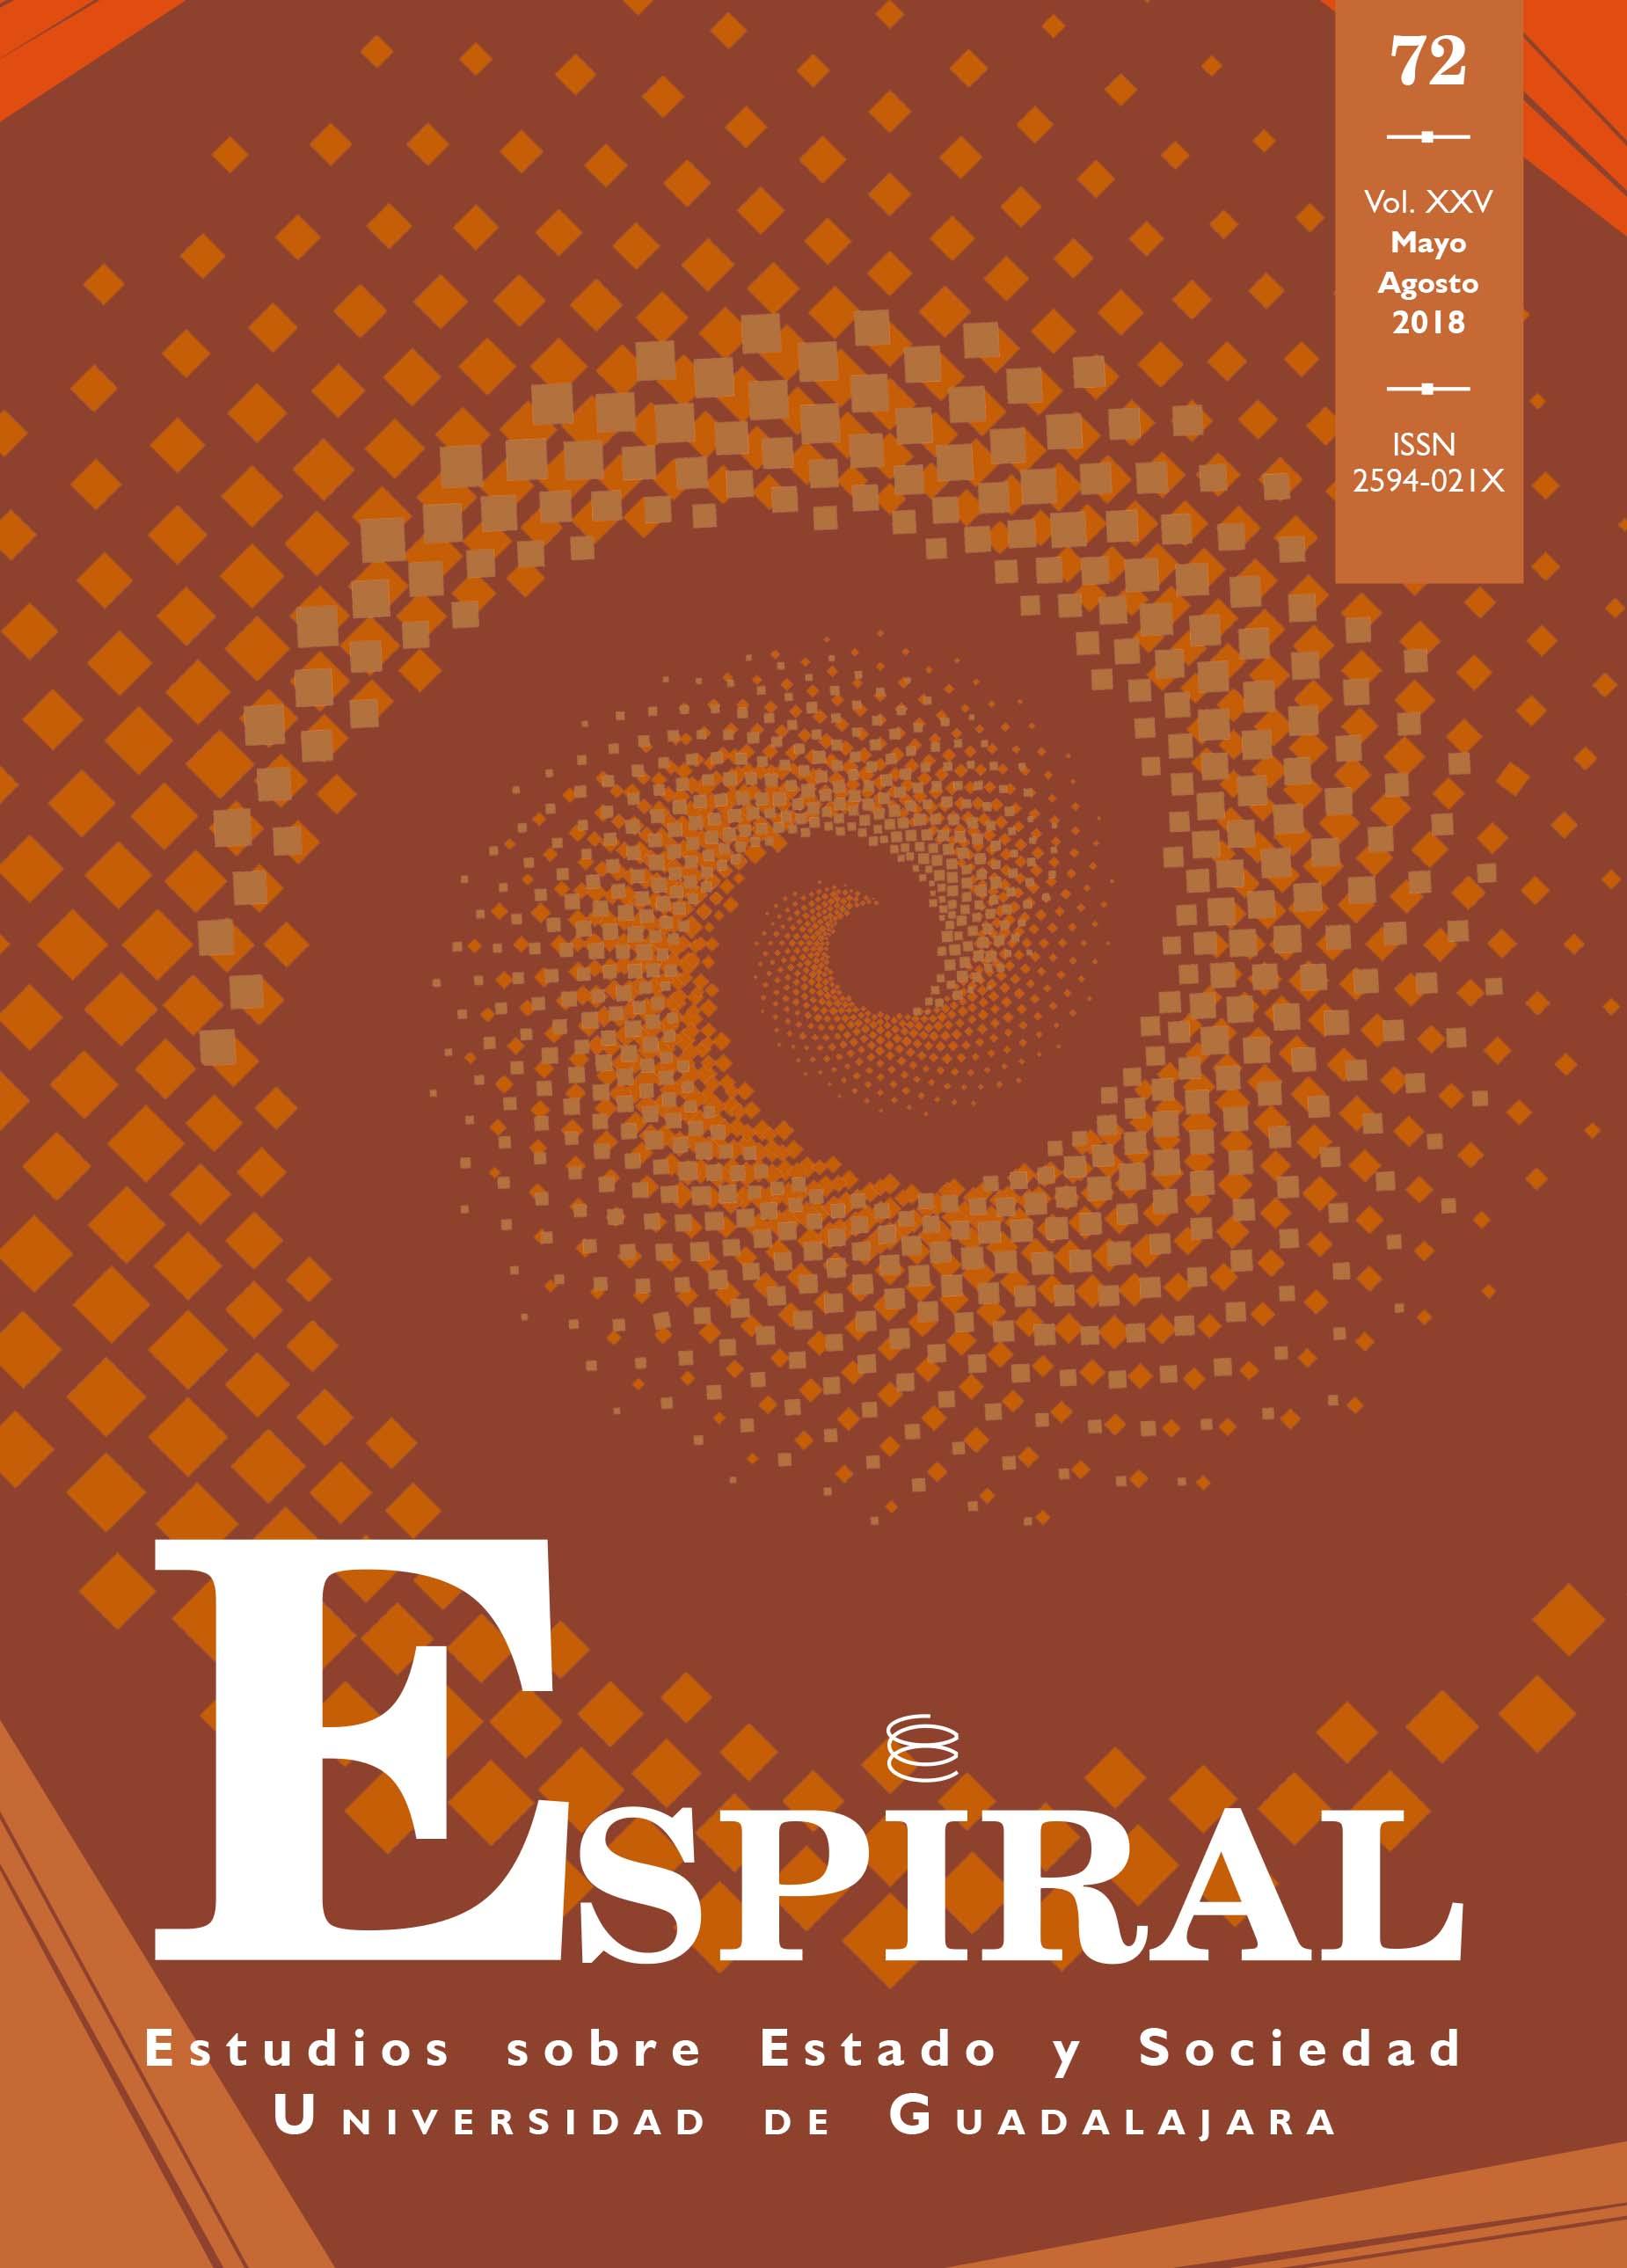 Ver Vol. 25 Núm. 72: Espiral 72 (mayo-agosto 2018)